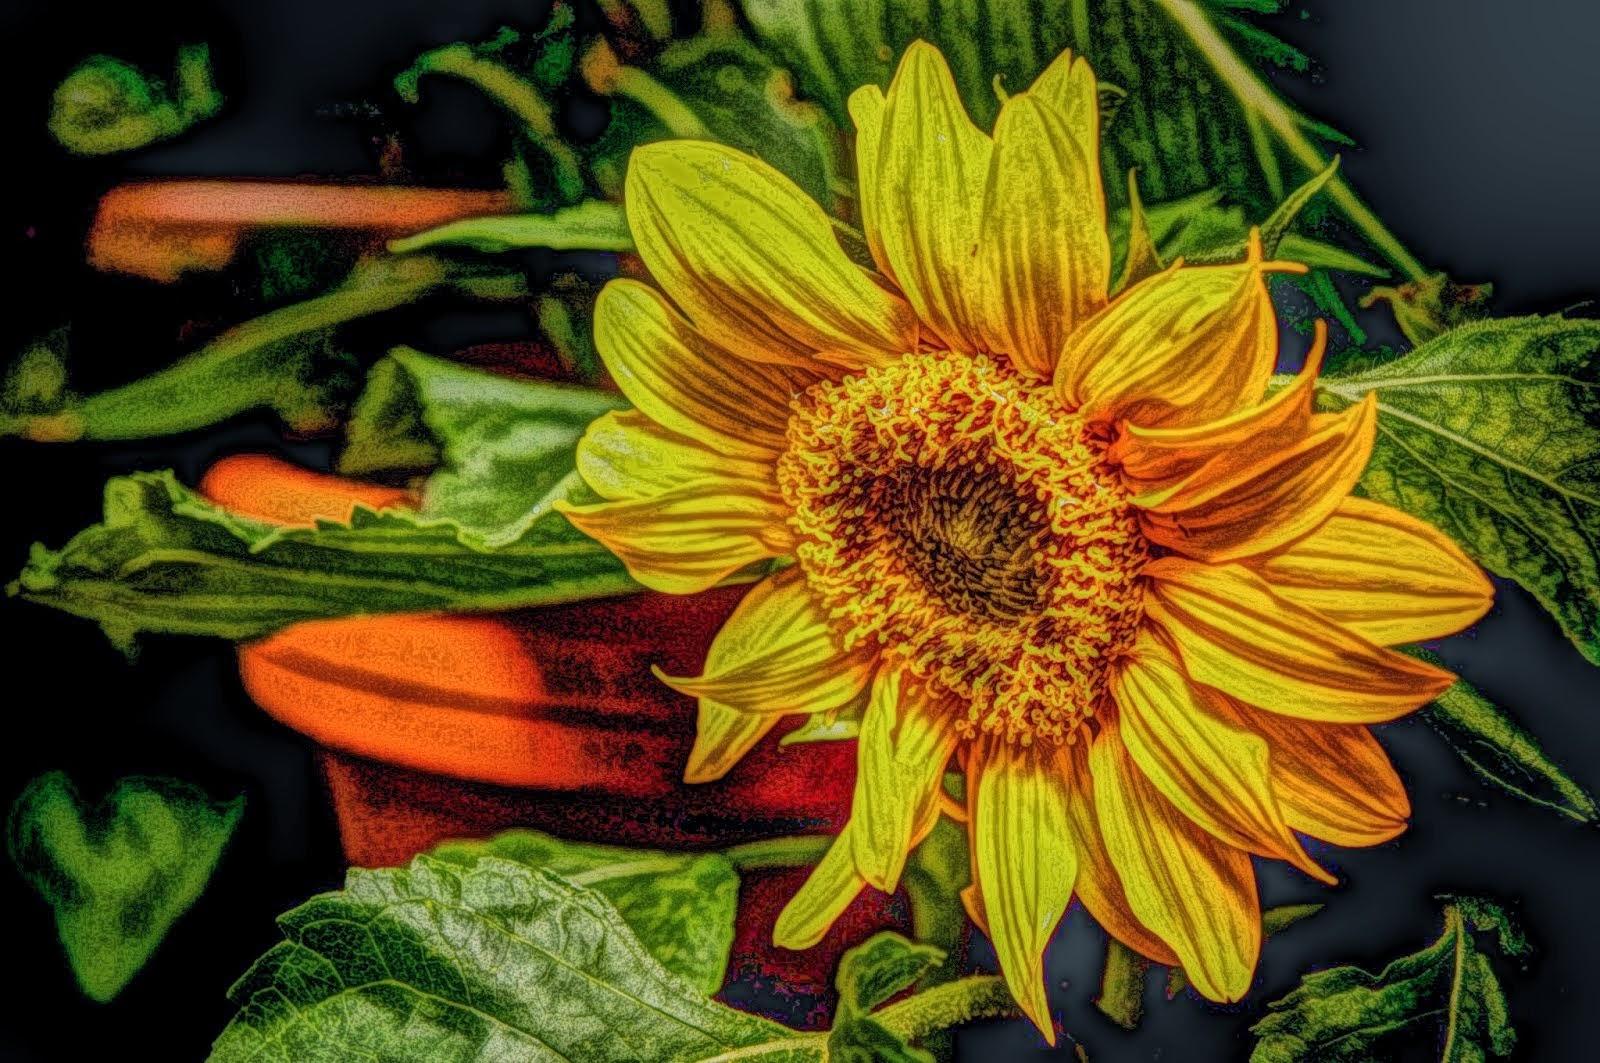 sun flower public domain picture edited using Paintereque